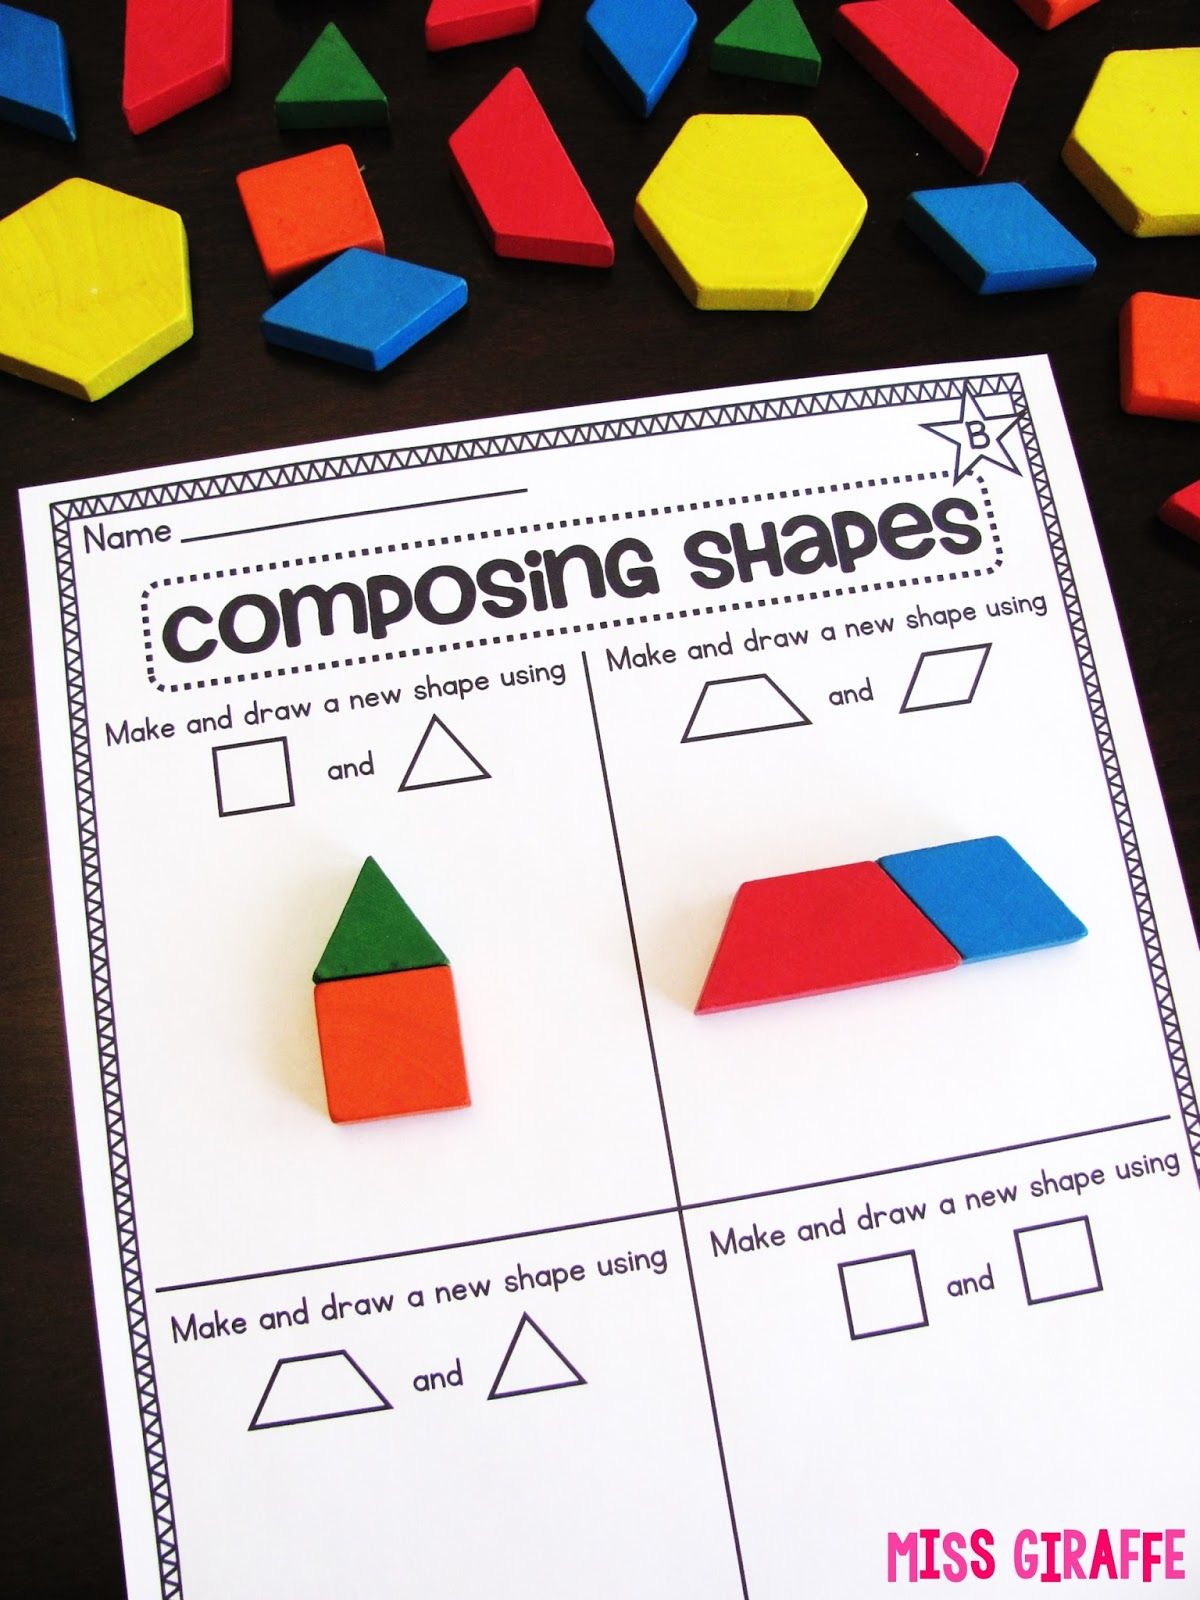 hight resolution of Miss Giraffe's Class: Composing Shapes in 1st Grade